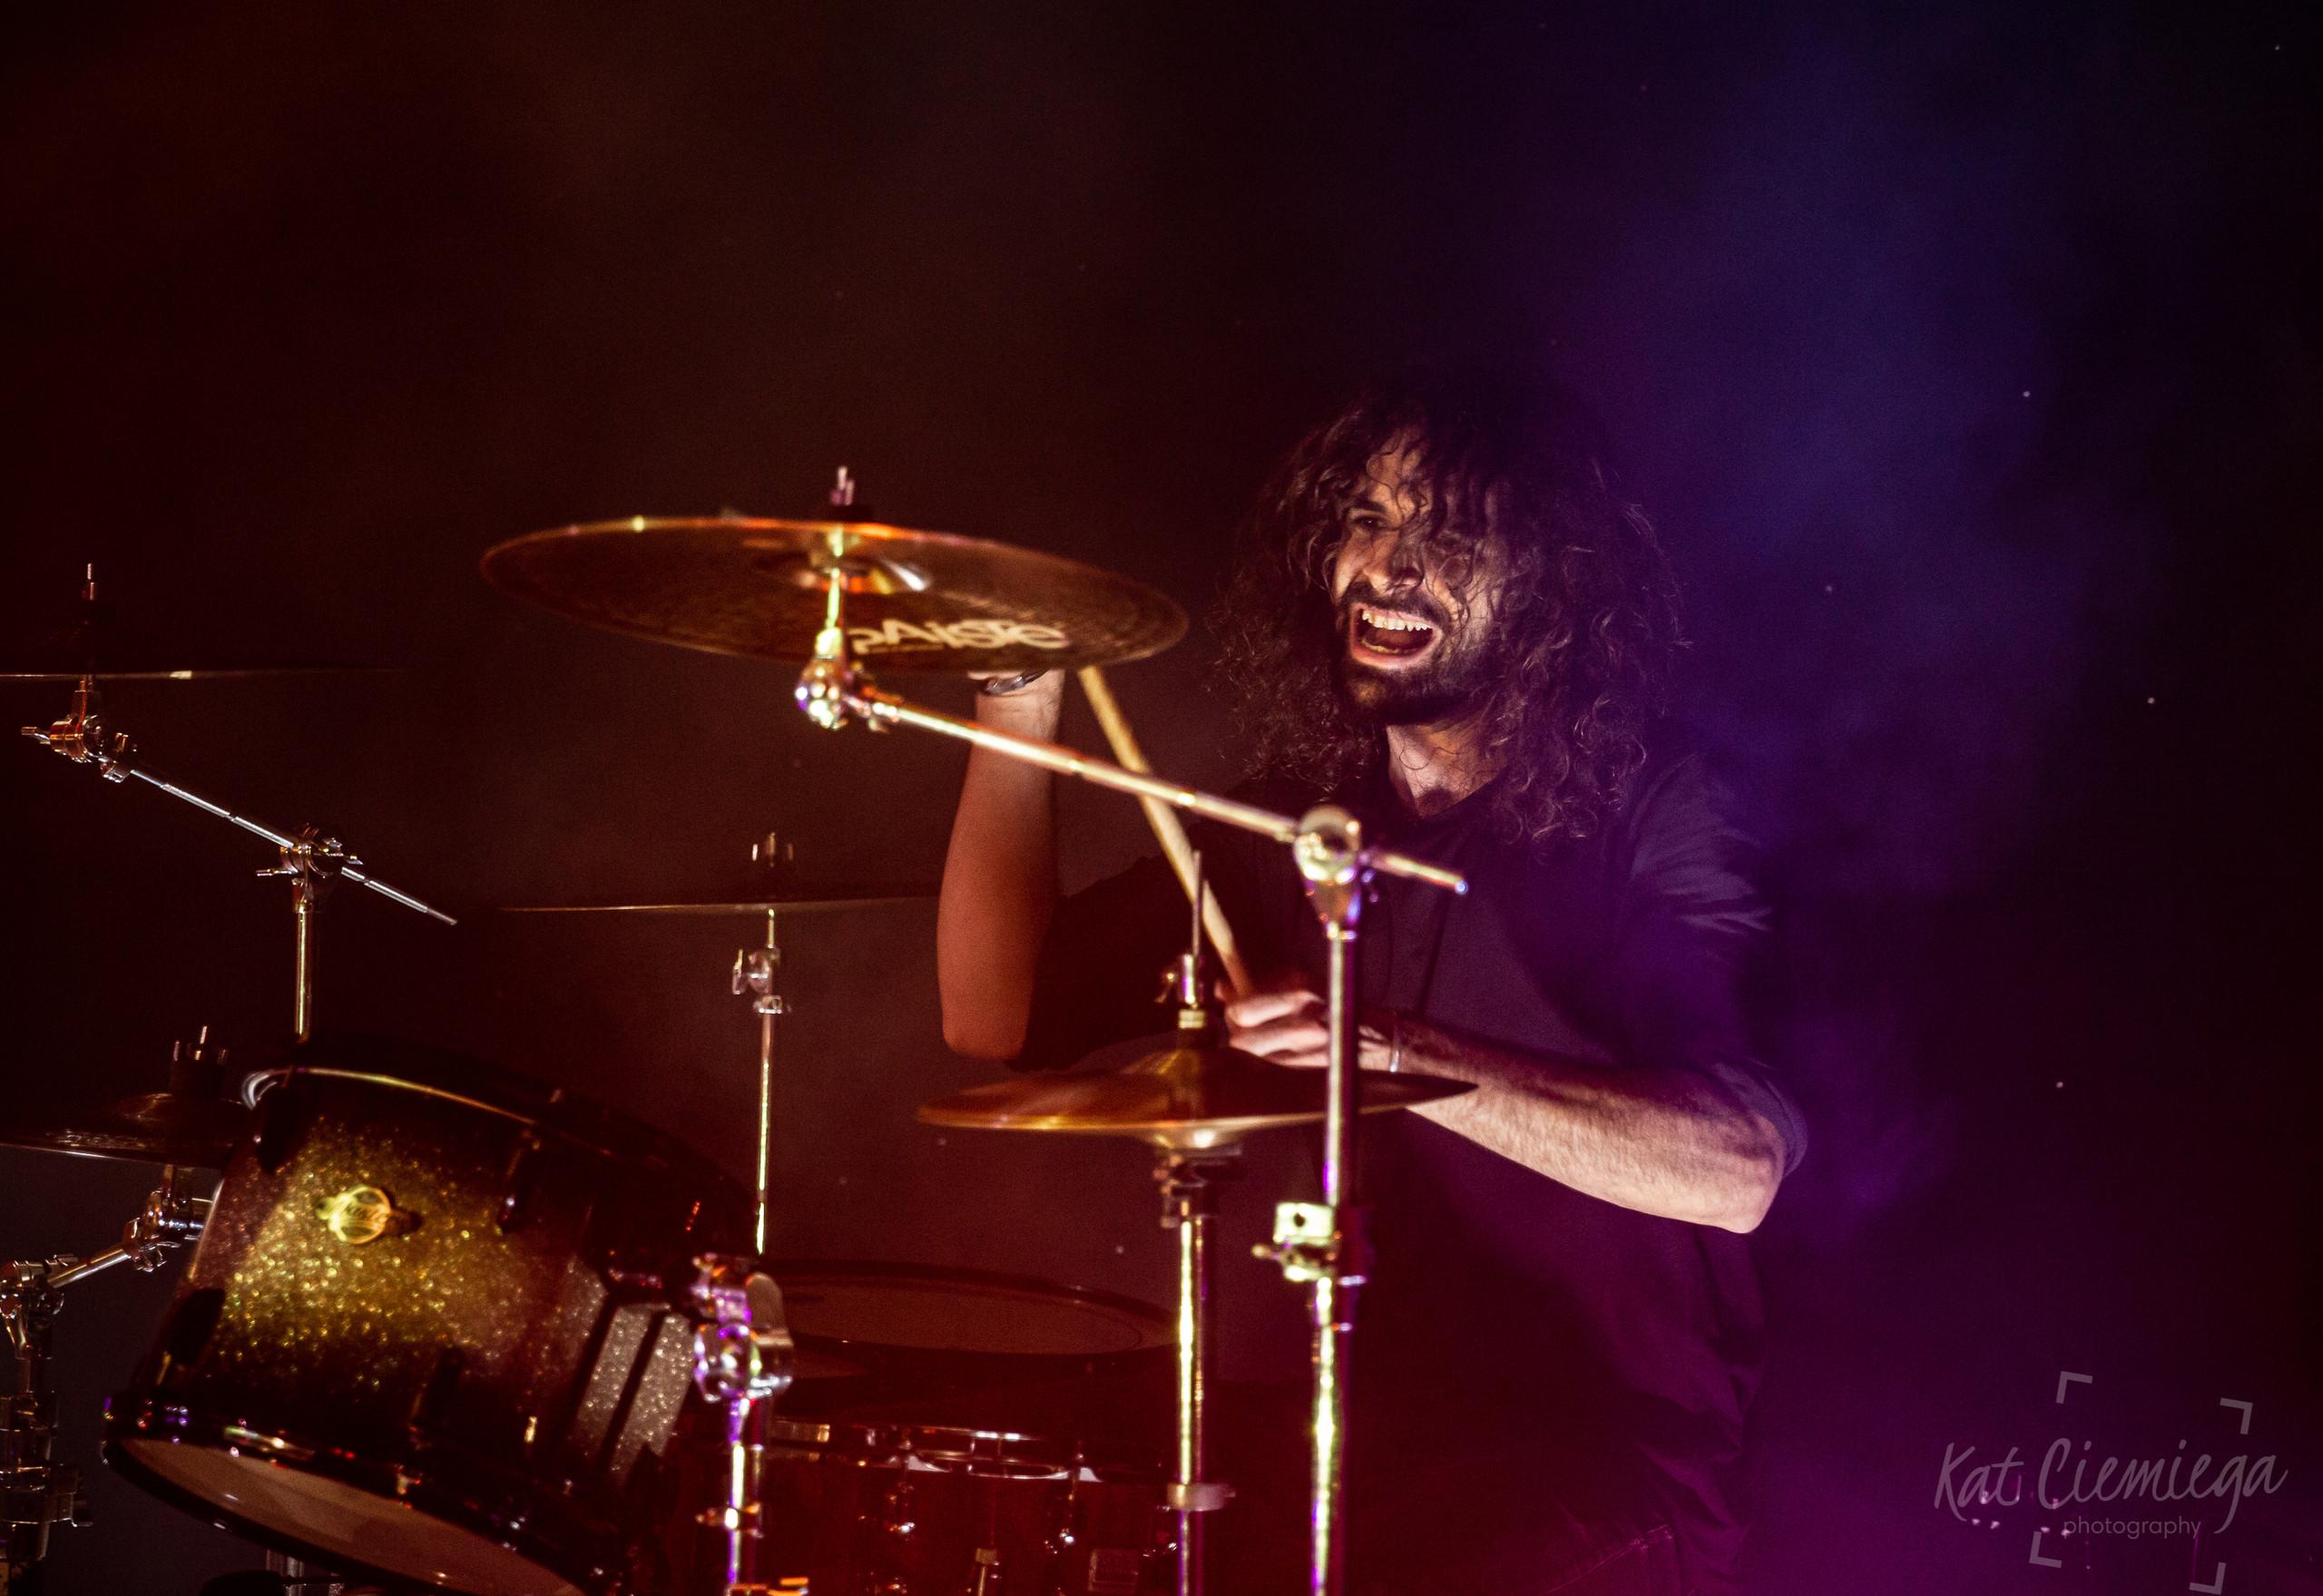 Kat Ciemiega Photography, music photography London, Metasoma, drummer, Hugo Terva